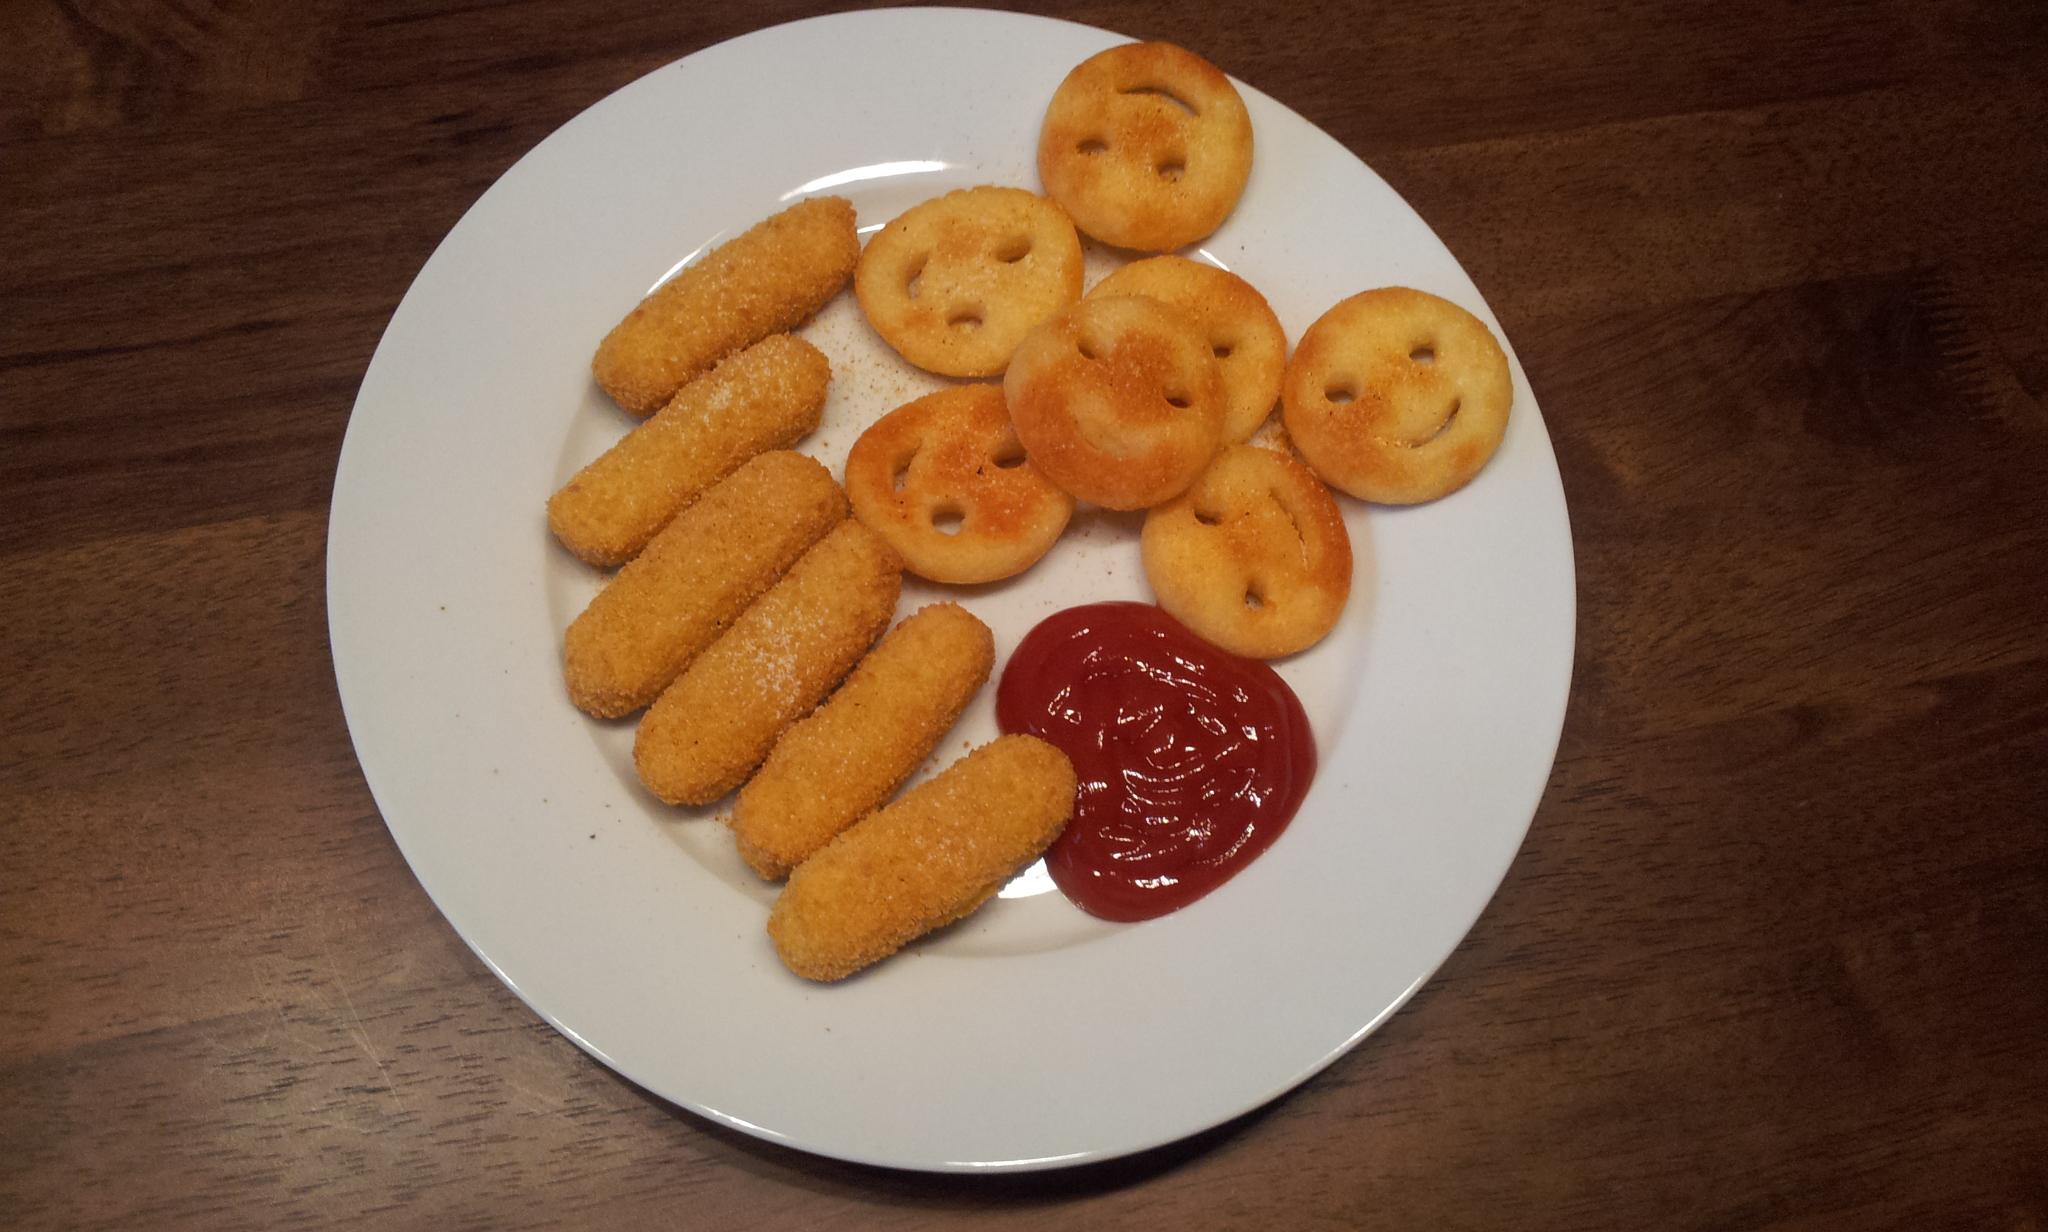 https://foodloader.net/Holz_2011-27-07_Frischkaesesticks_mit_Smiles.jpg